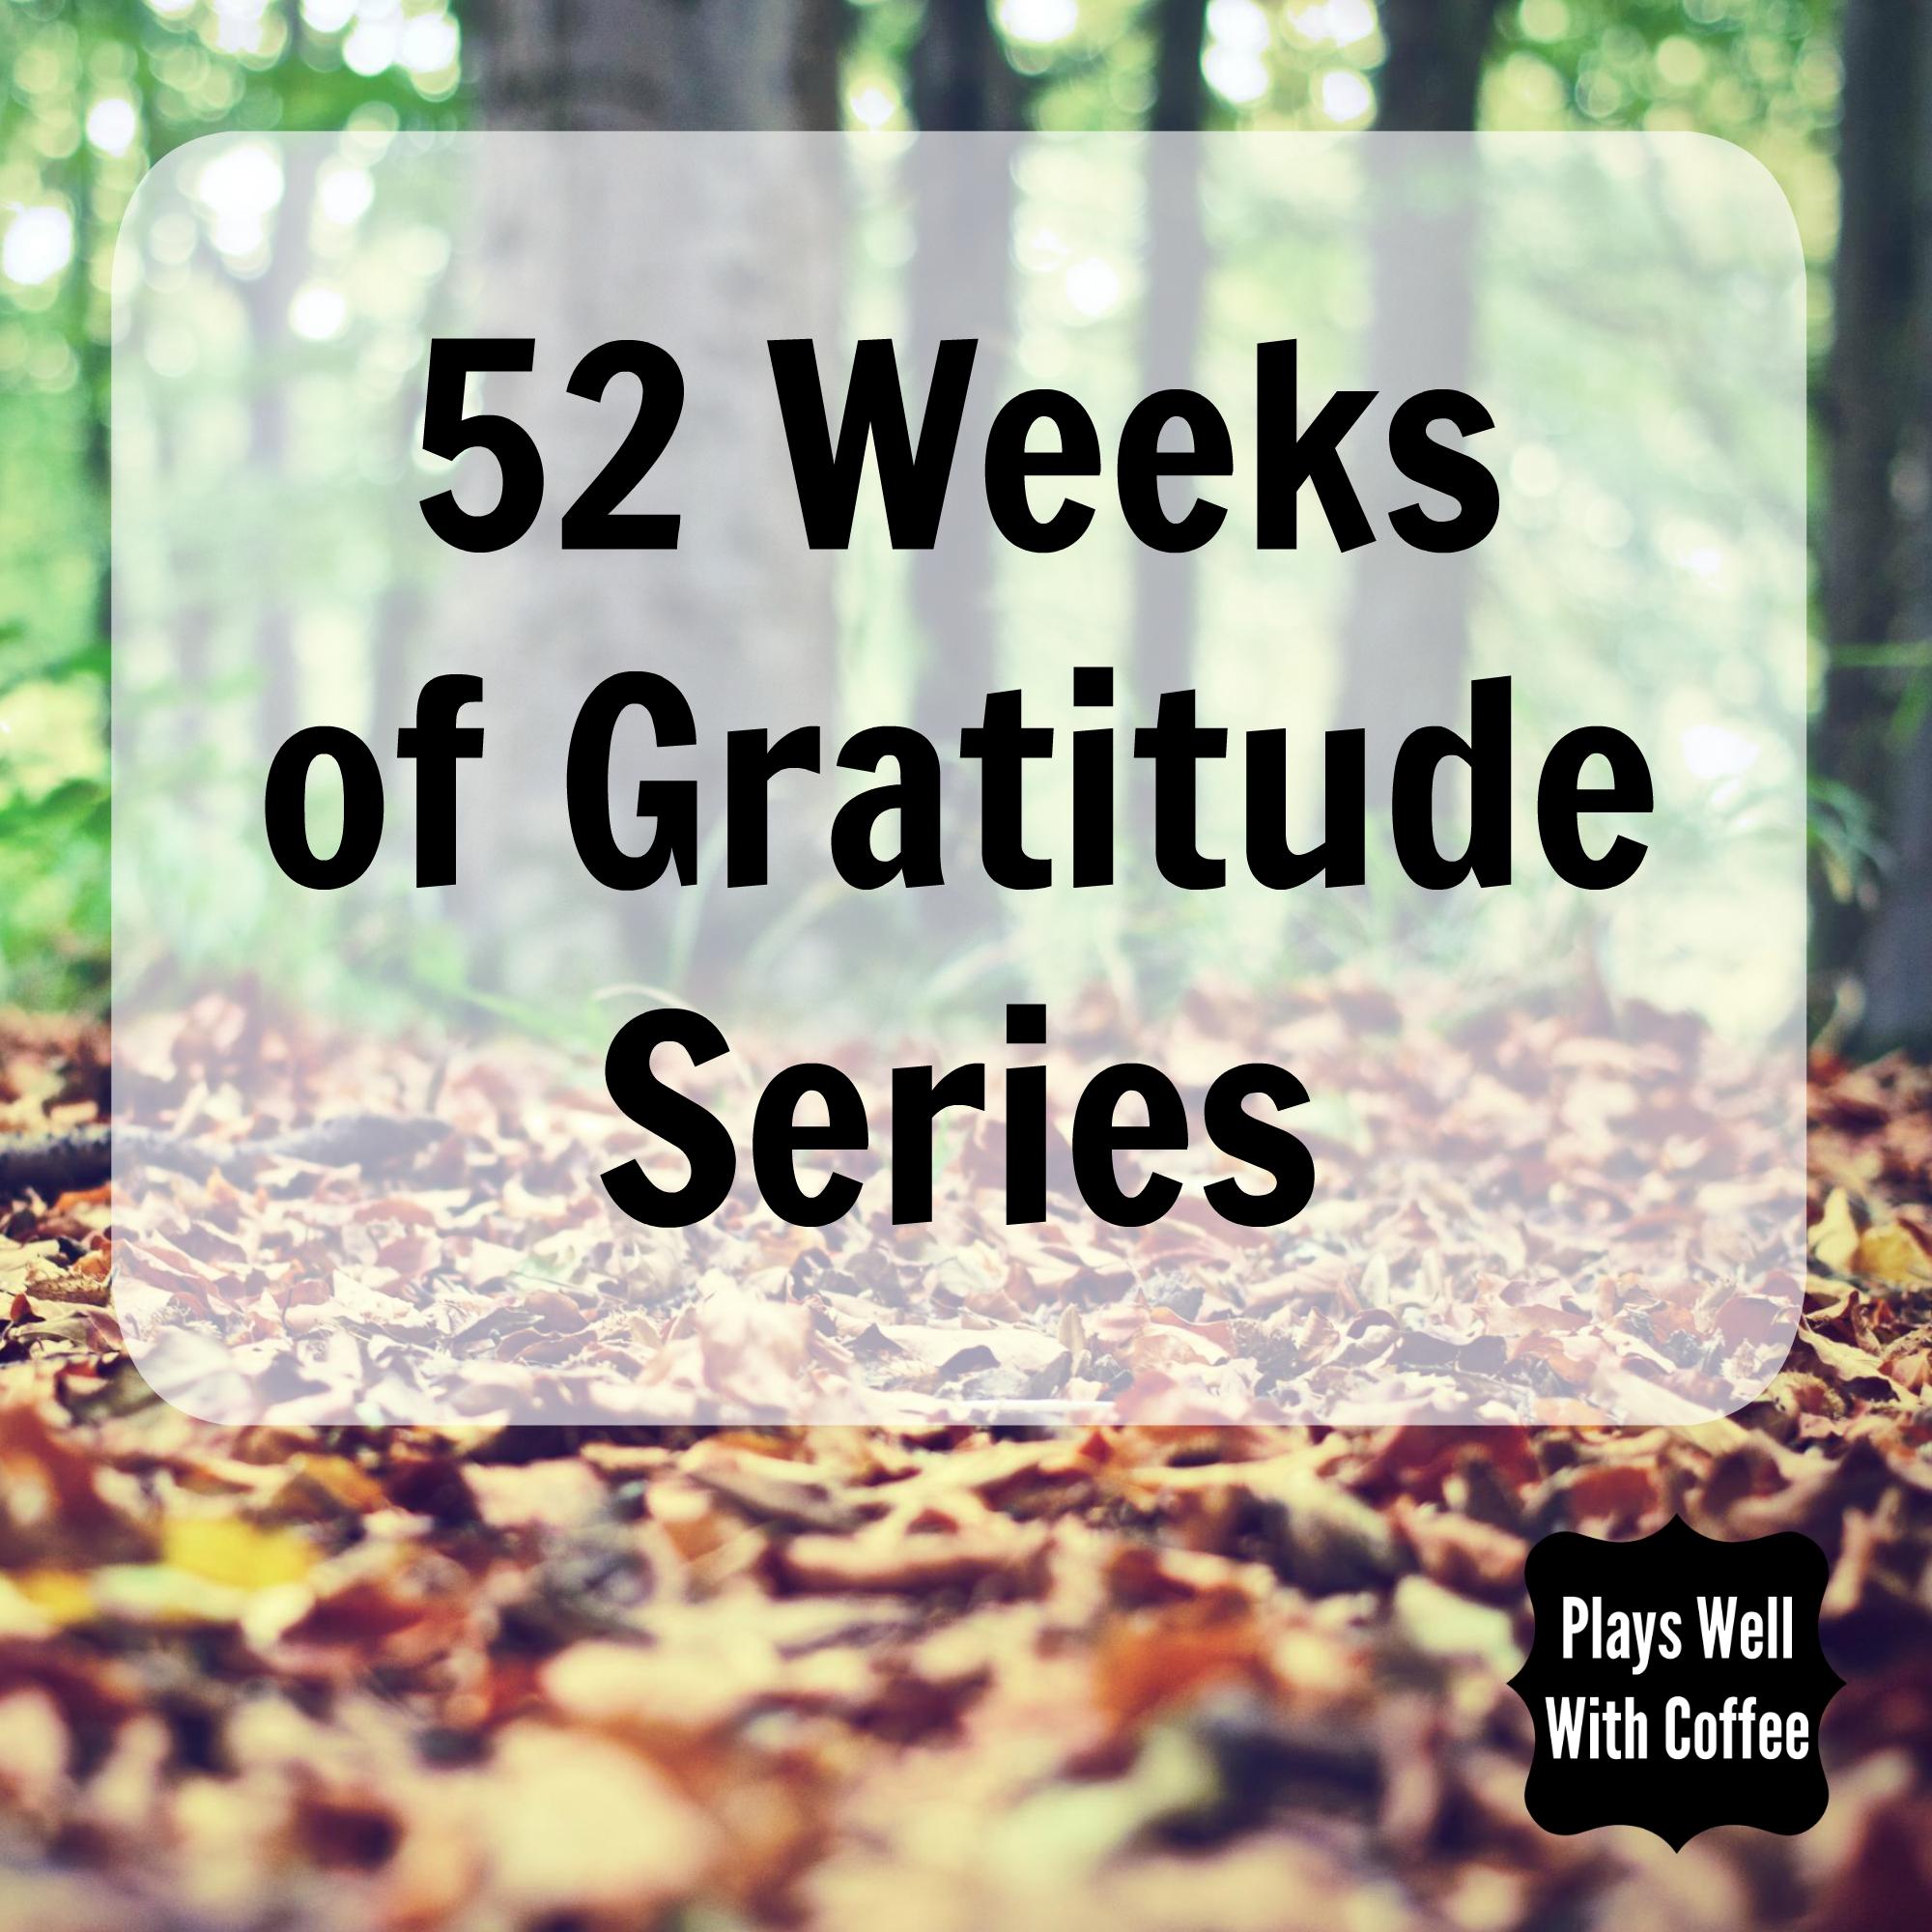 52 Weeks of Gratitude